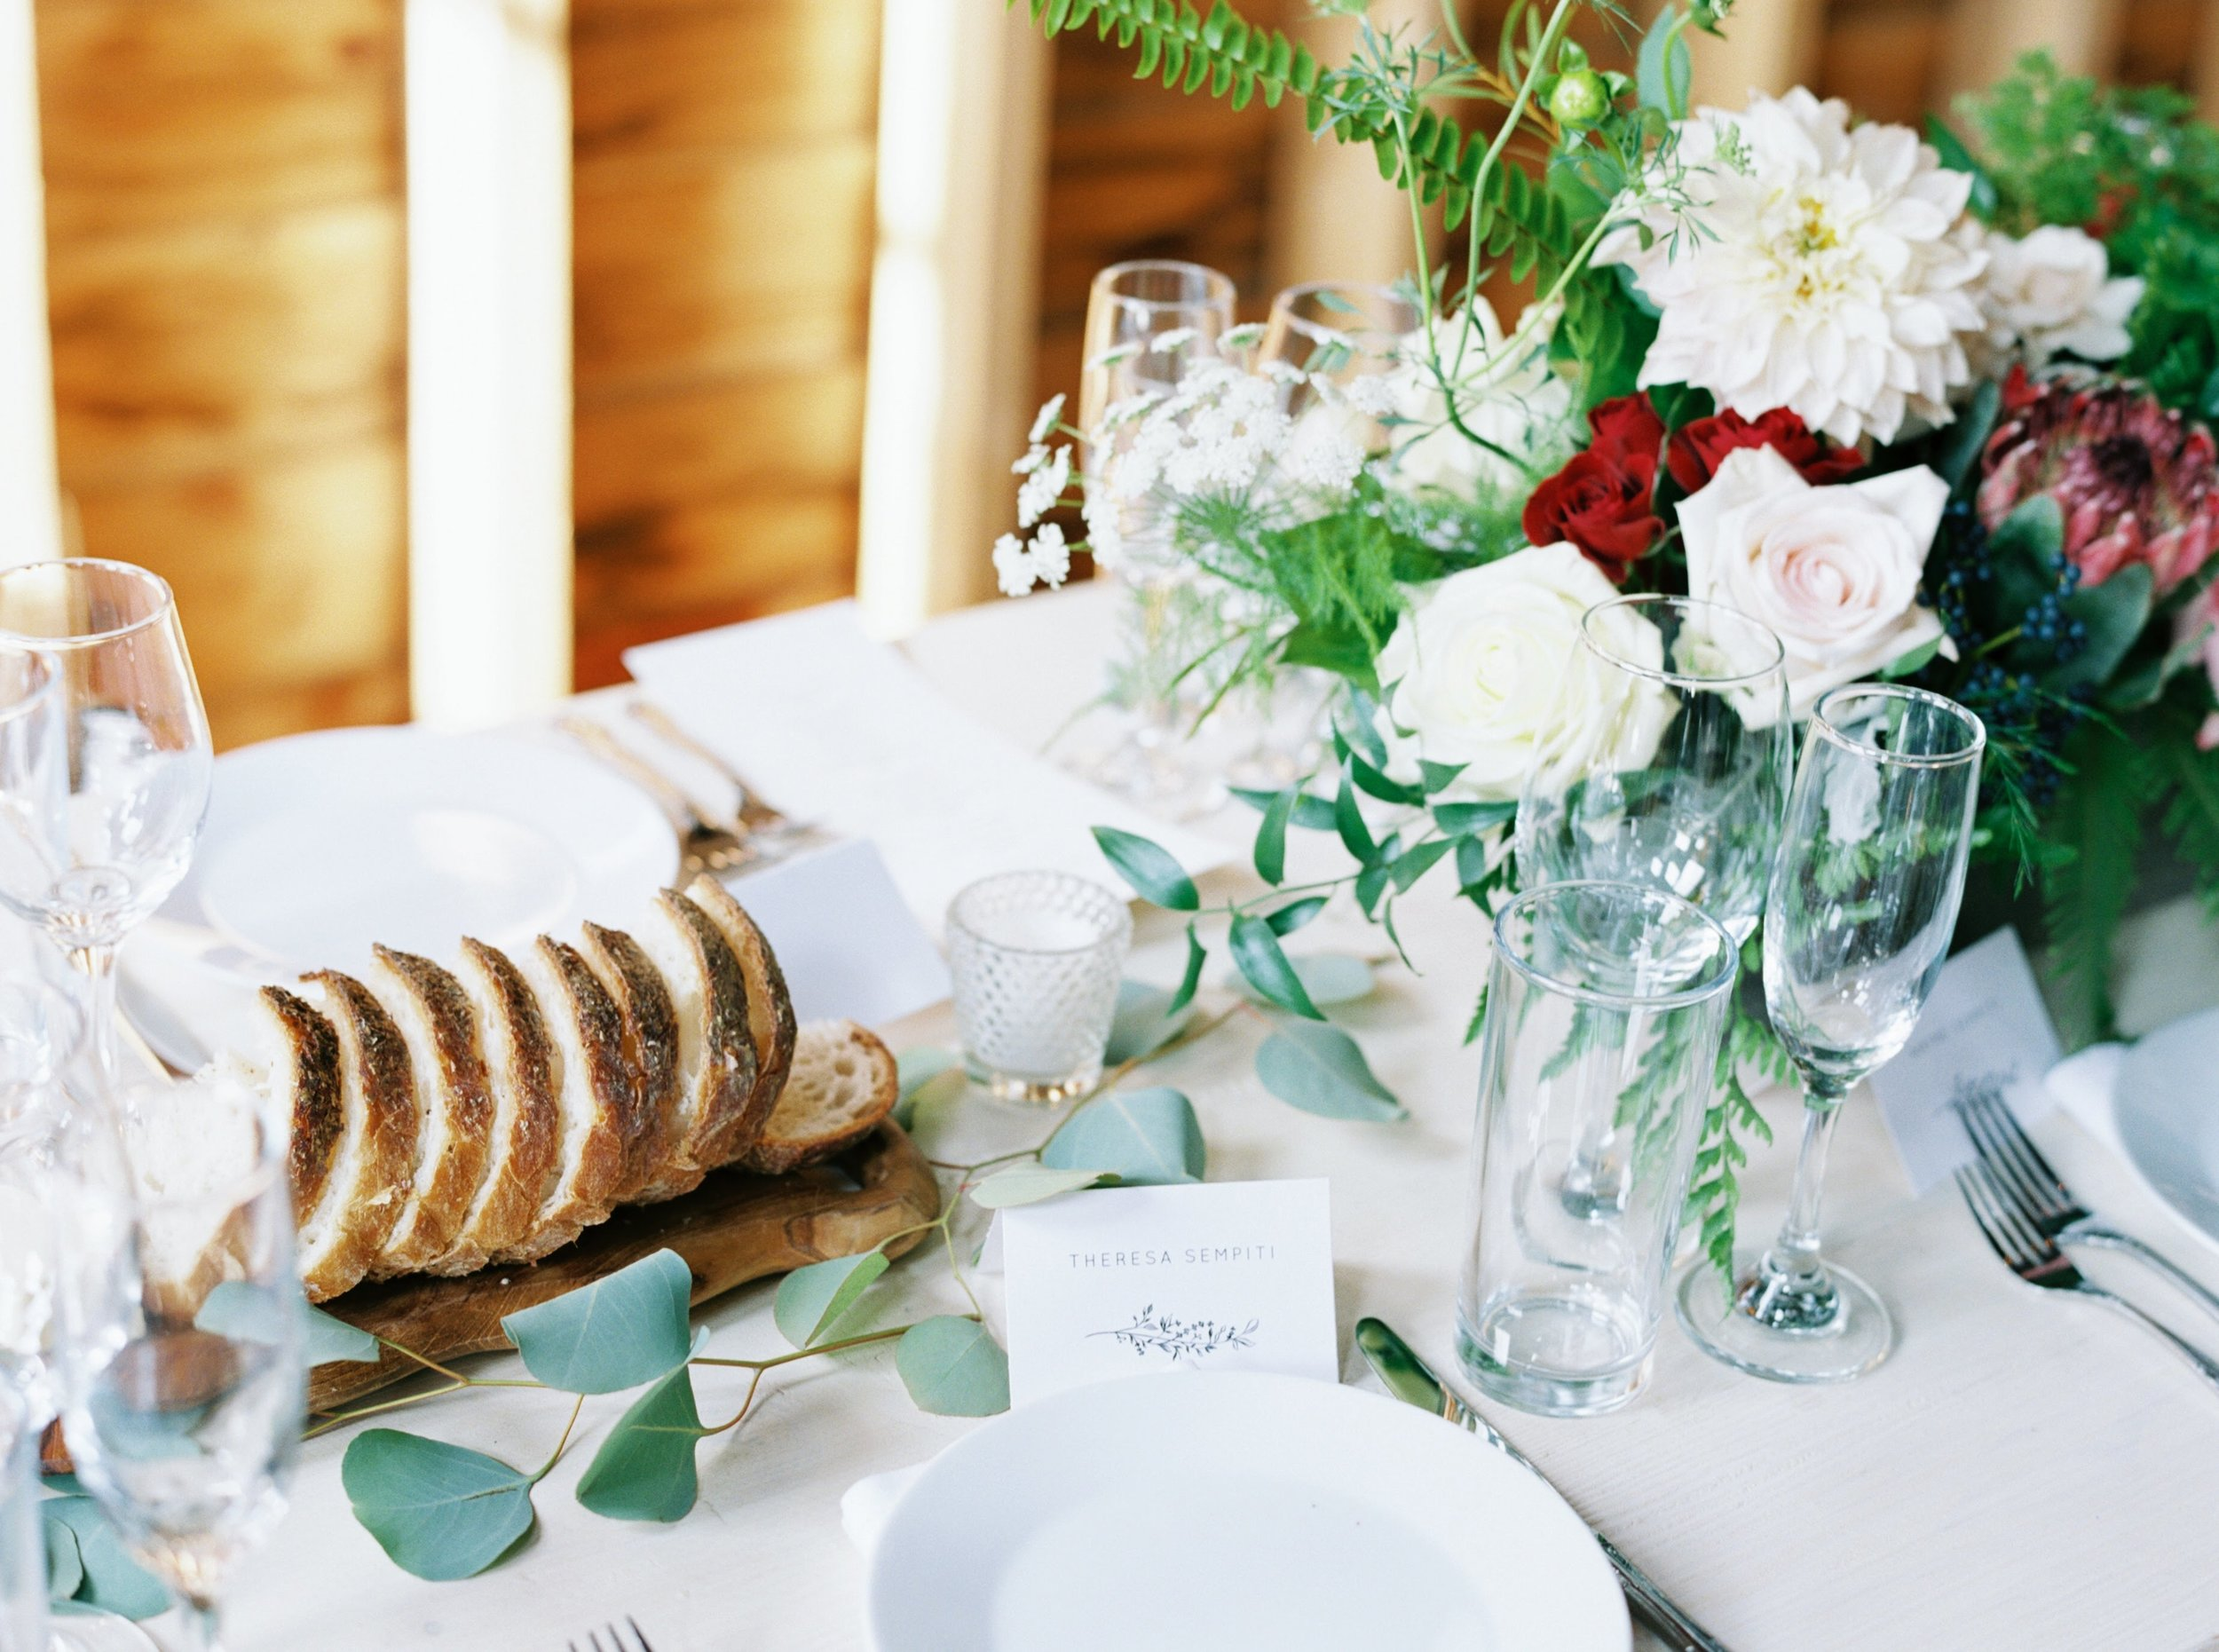 Courtney + Matt Blenheim Hill Farm Catskills NY Wedding Veronica Lola Photography 2017-325.jpg